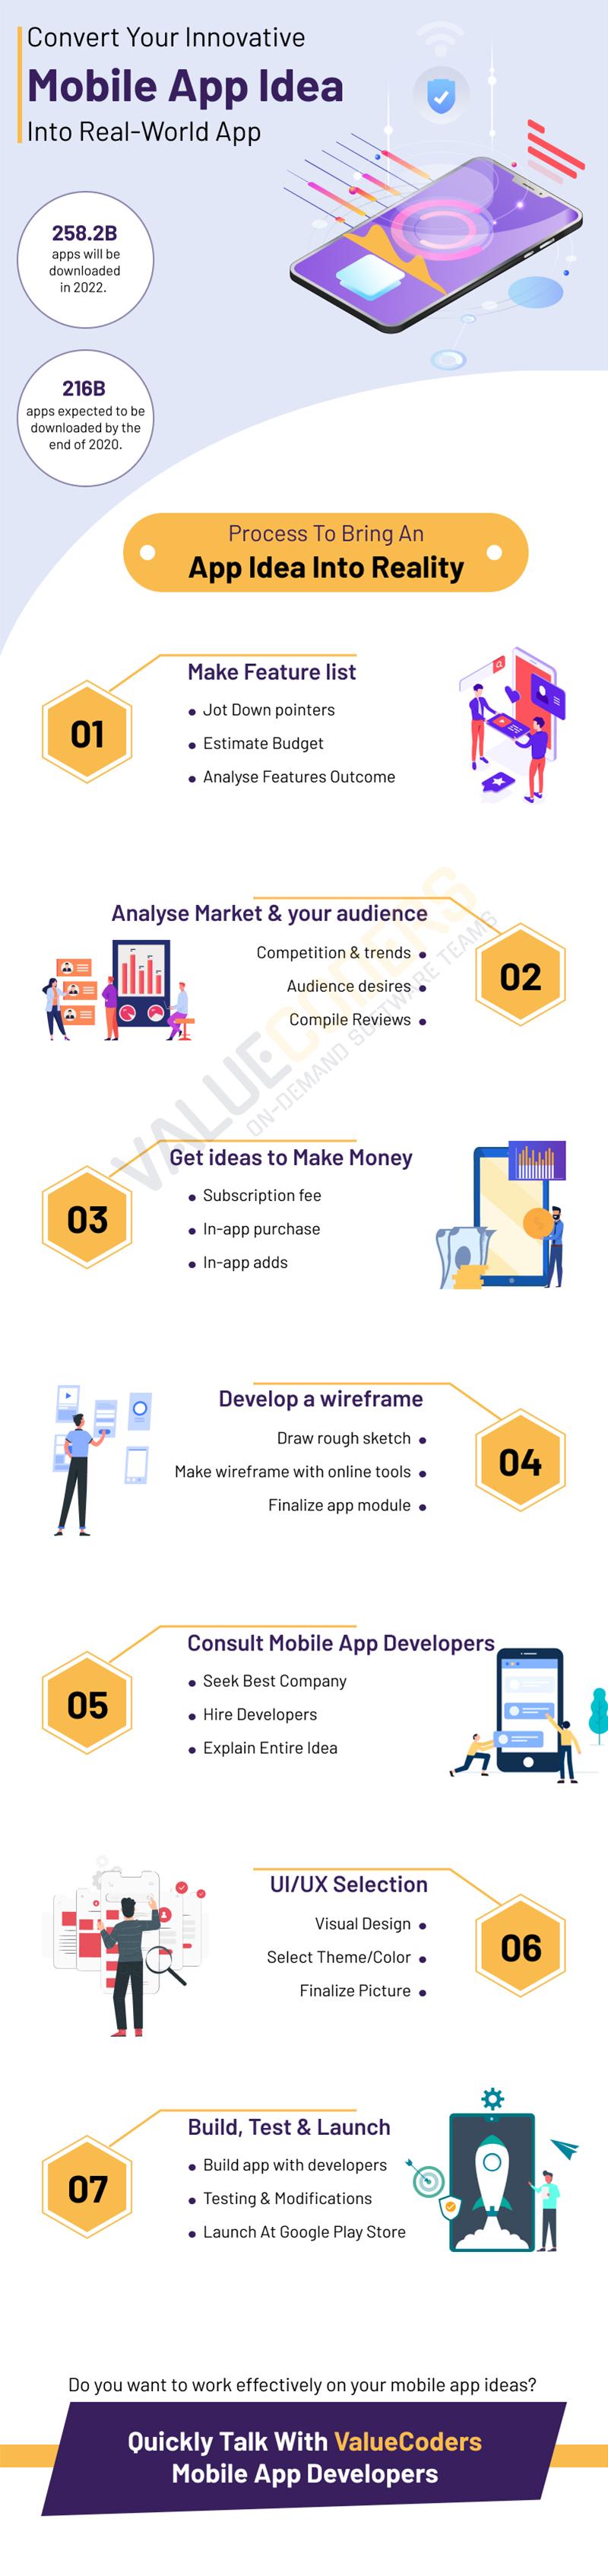 Convert Your Innovative Mobile App Idea Into Real-World App | Best mobile app development company in India | Transform Your Mobile App Idea Into Reality